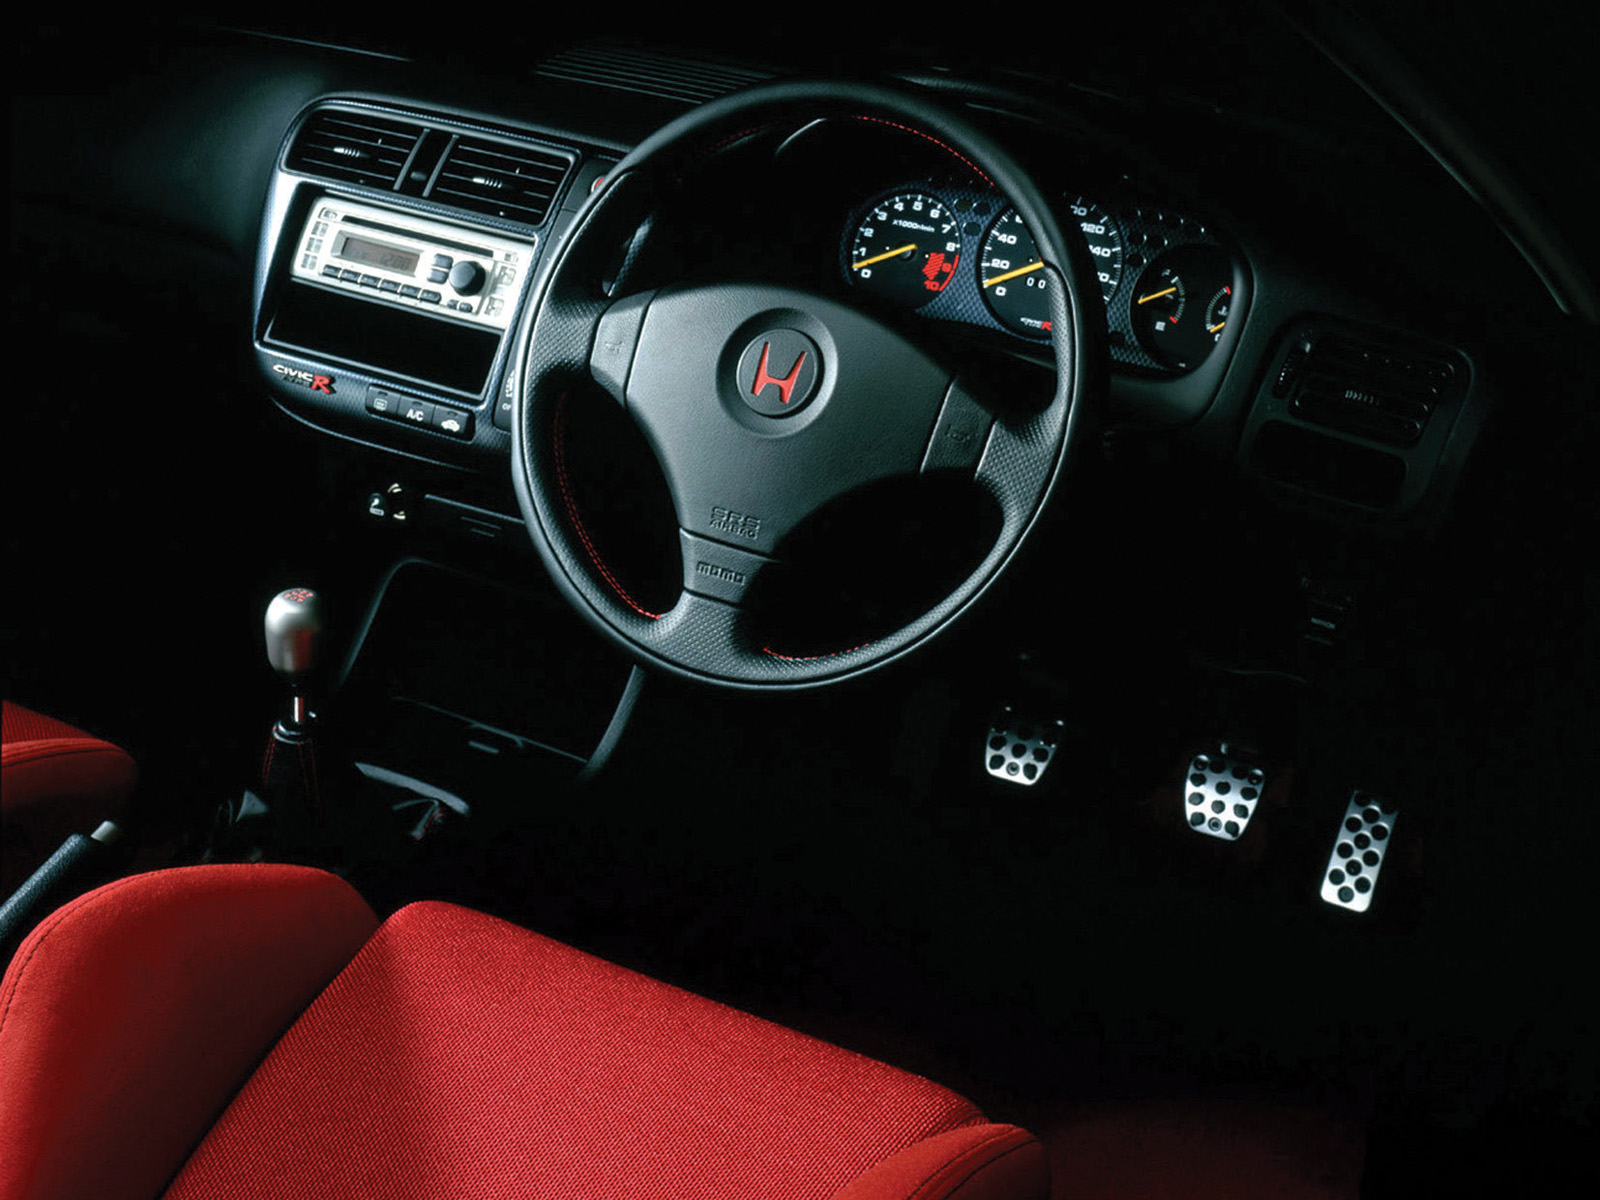 Front panel Honda Civic Type R X [JP spec] EK9 121999082000 1600x1200